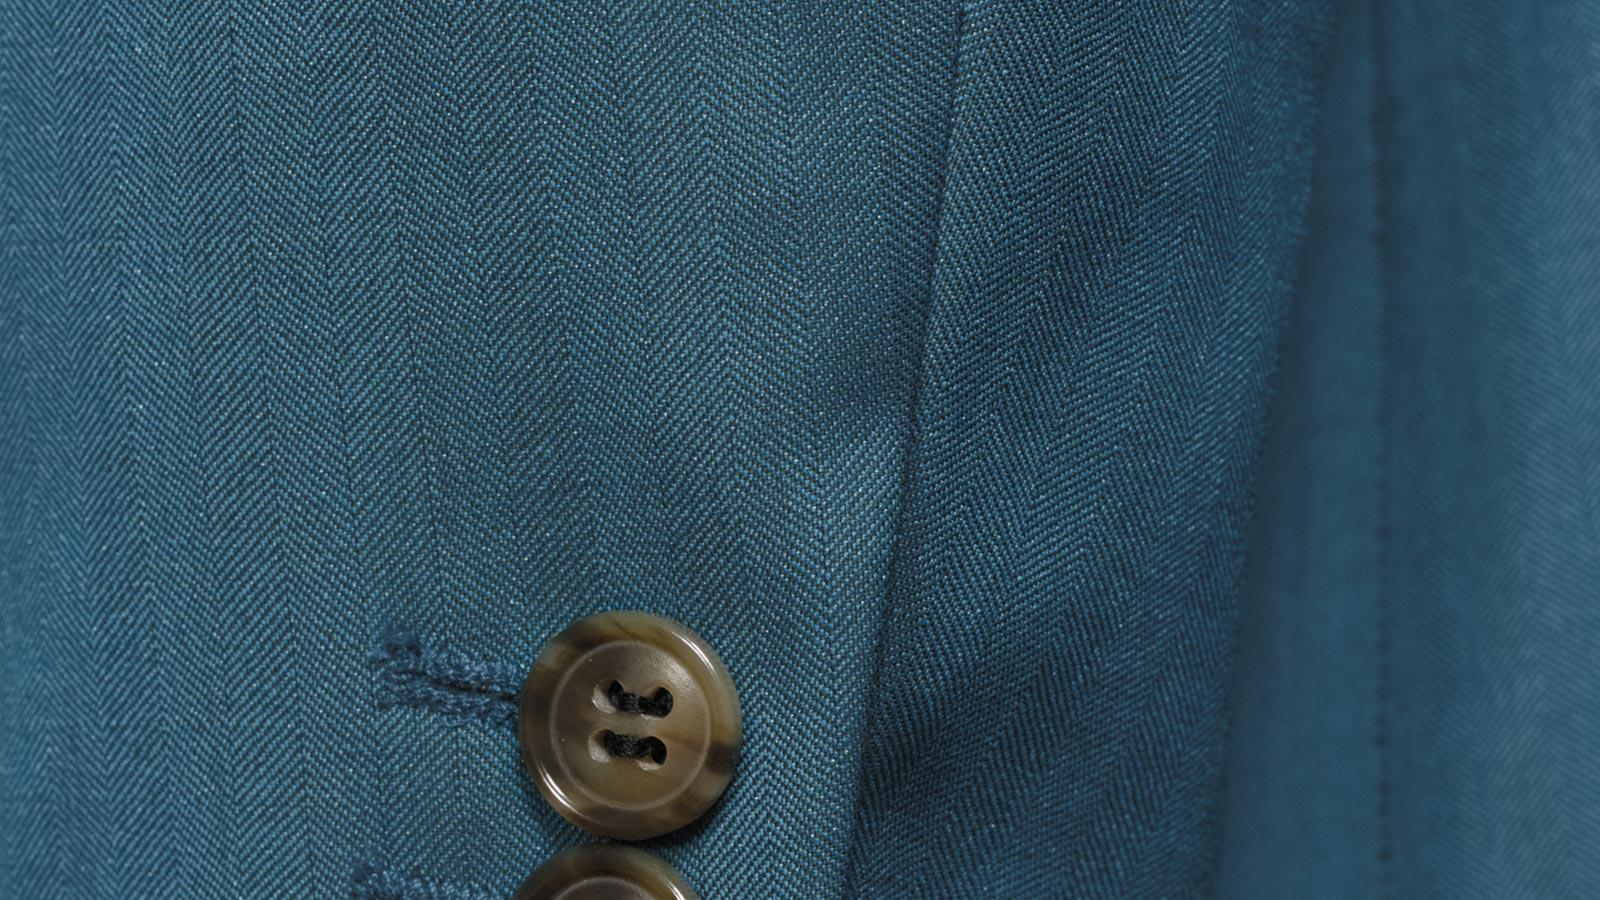 Teal Blue Wool & Silk Suit - slider image 1